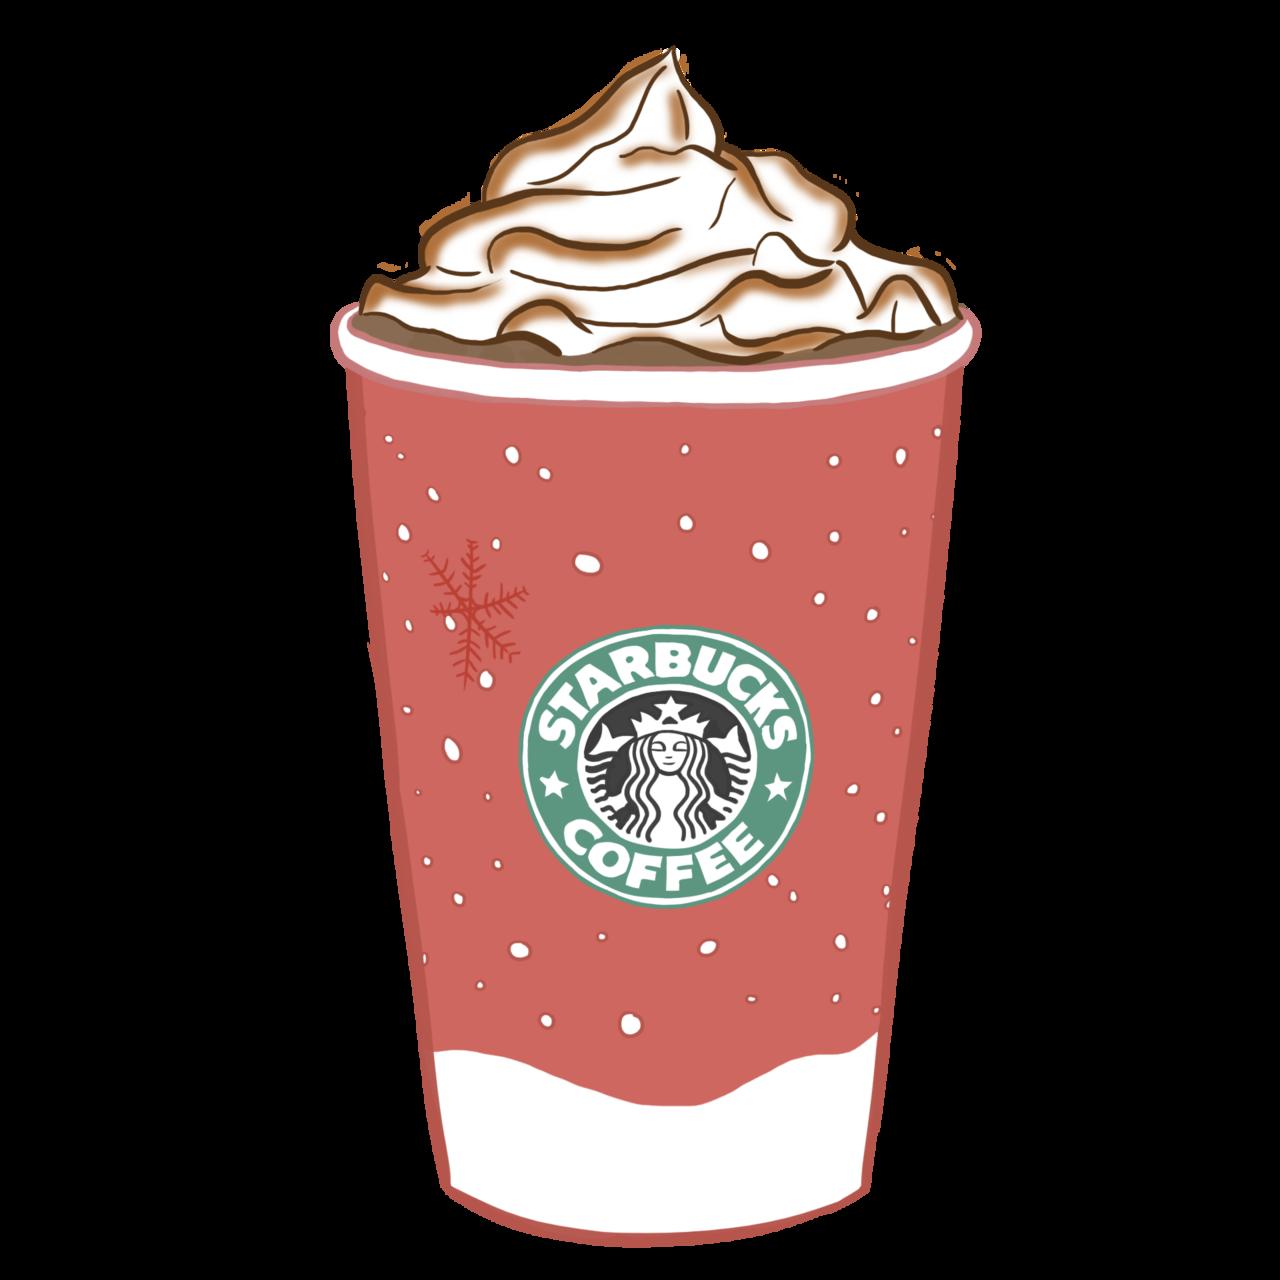 Winter clipart drink. Images for starbucks transparent